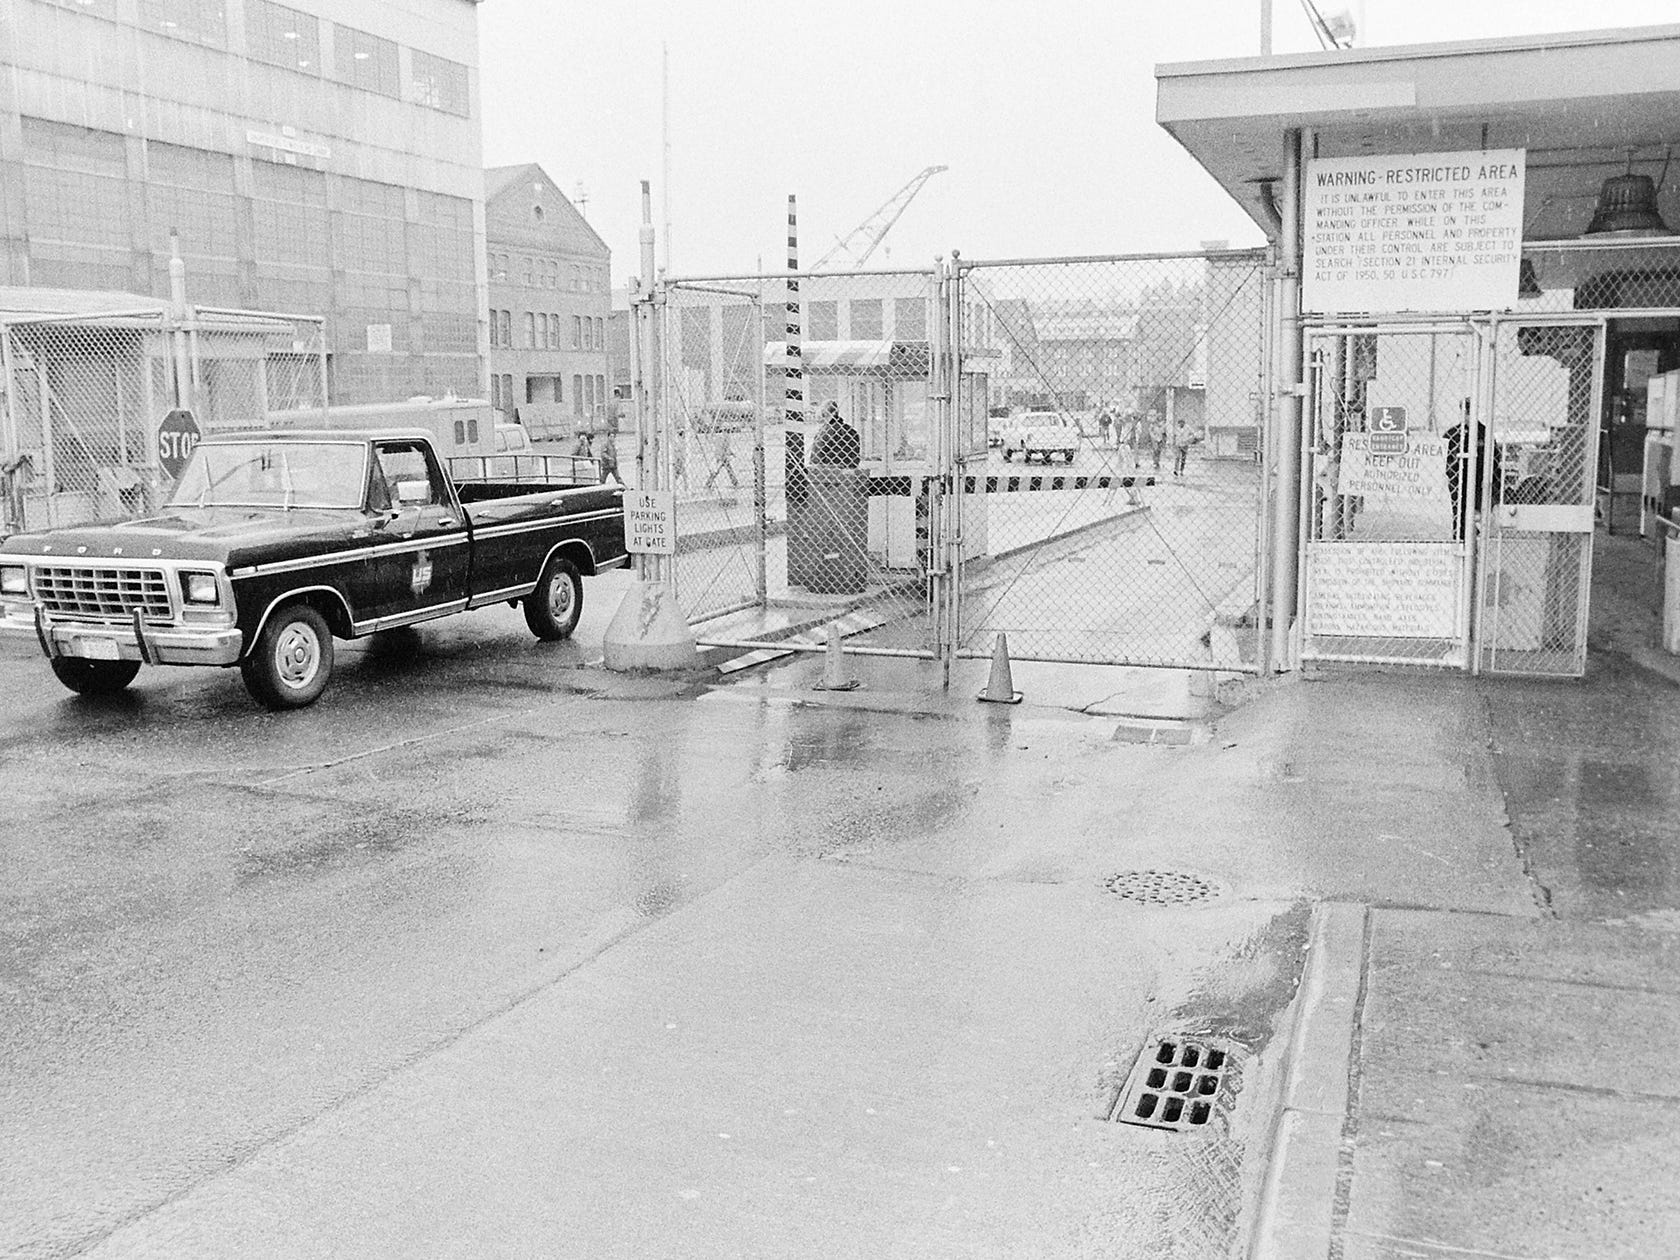 03/14/84New Navy Yard Gate